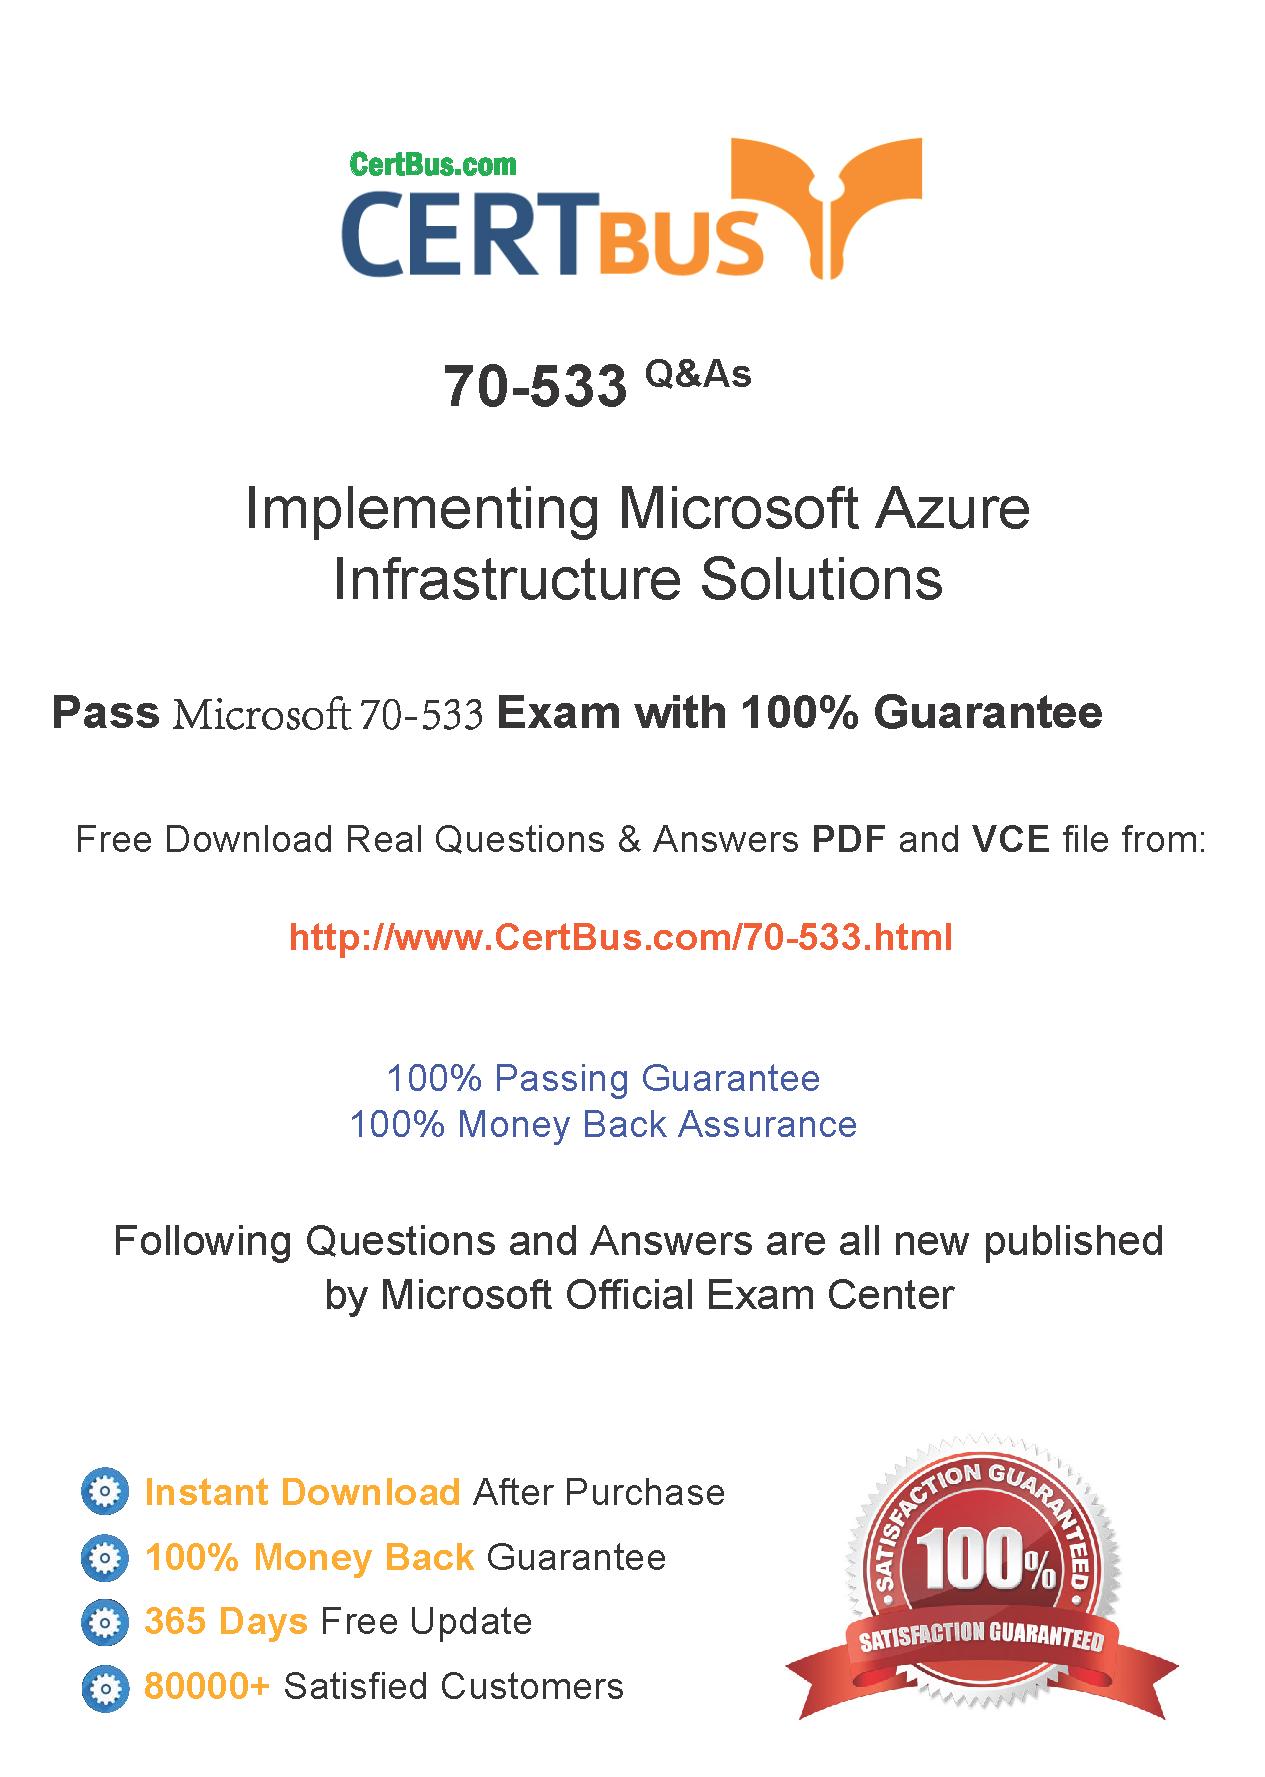 Certbus microsoft 70 533 free pdfvce exam practice test dumps certbus microsoft 70 533 free pdfvce exam practice test dumps download real qas 1betcityfo Choice Image